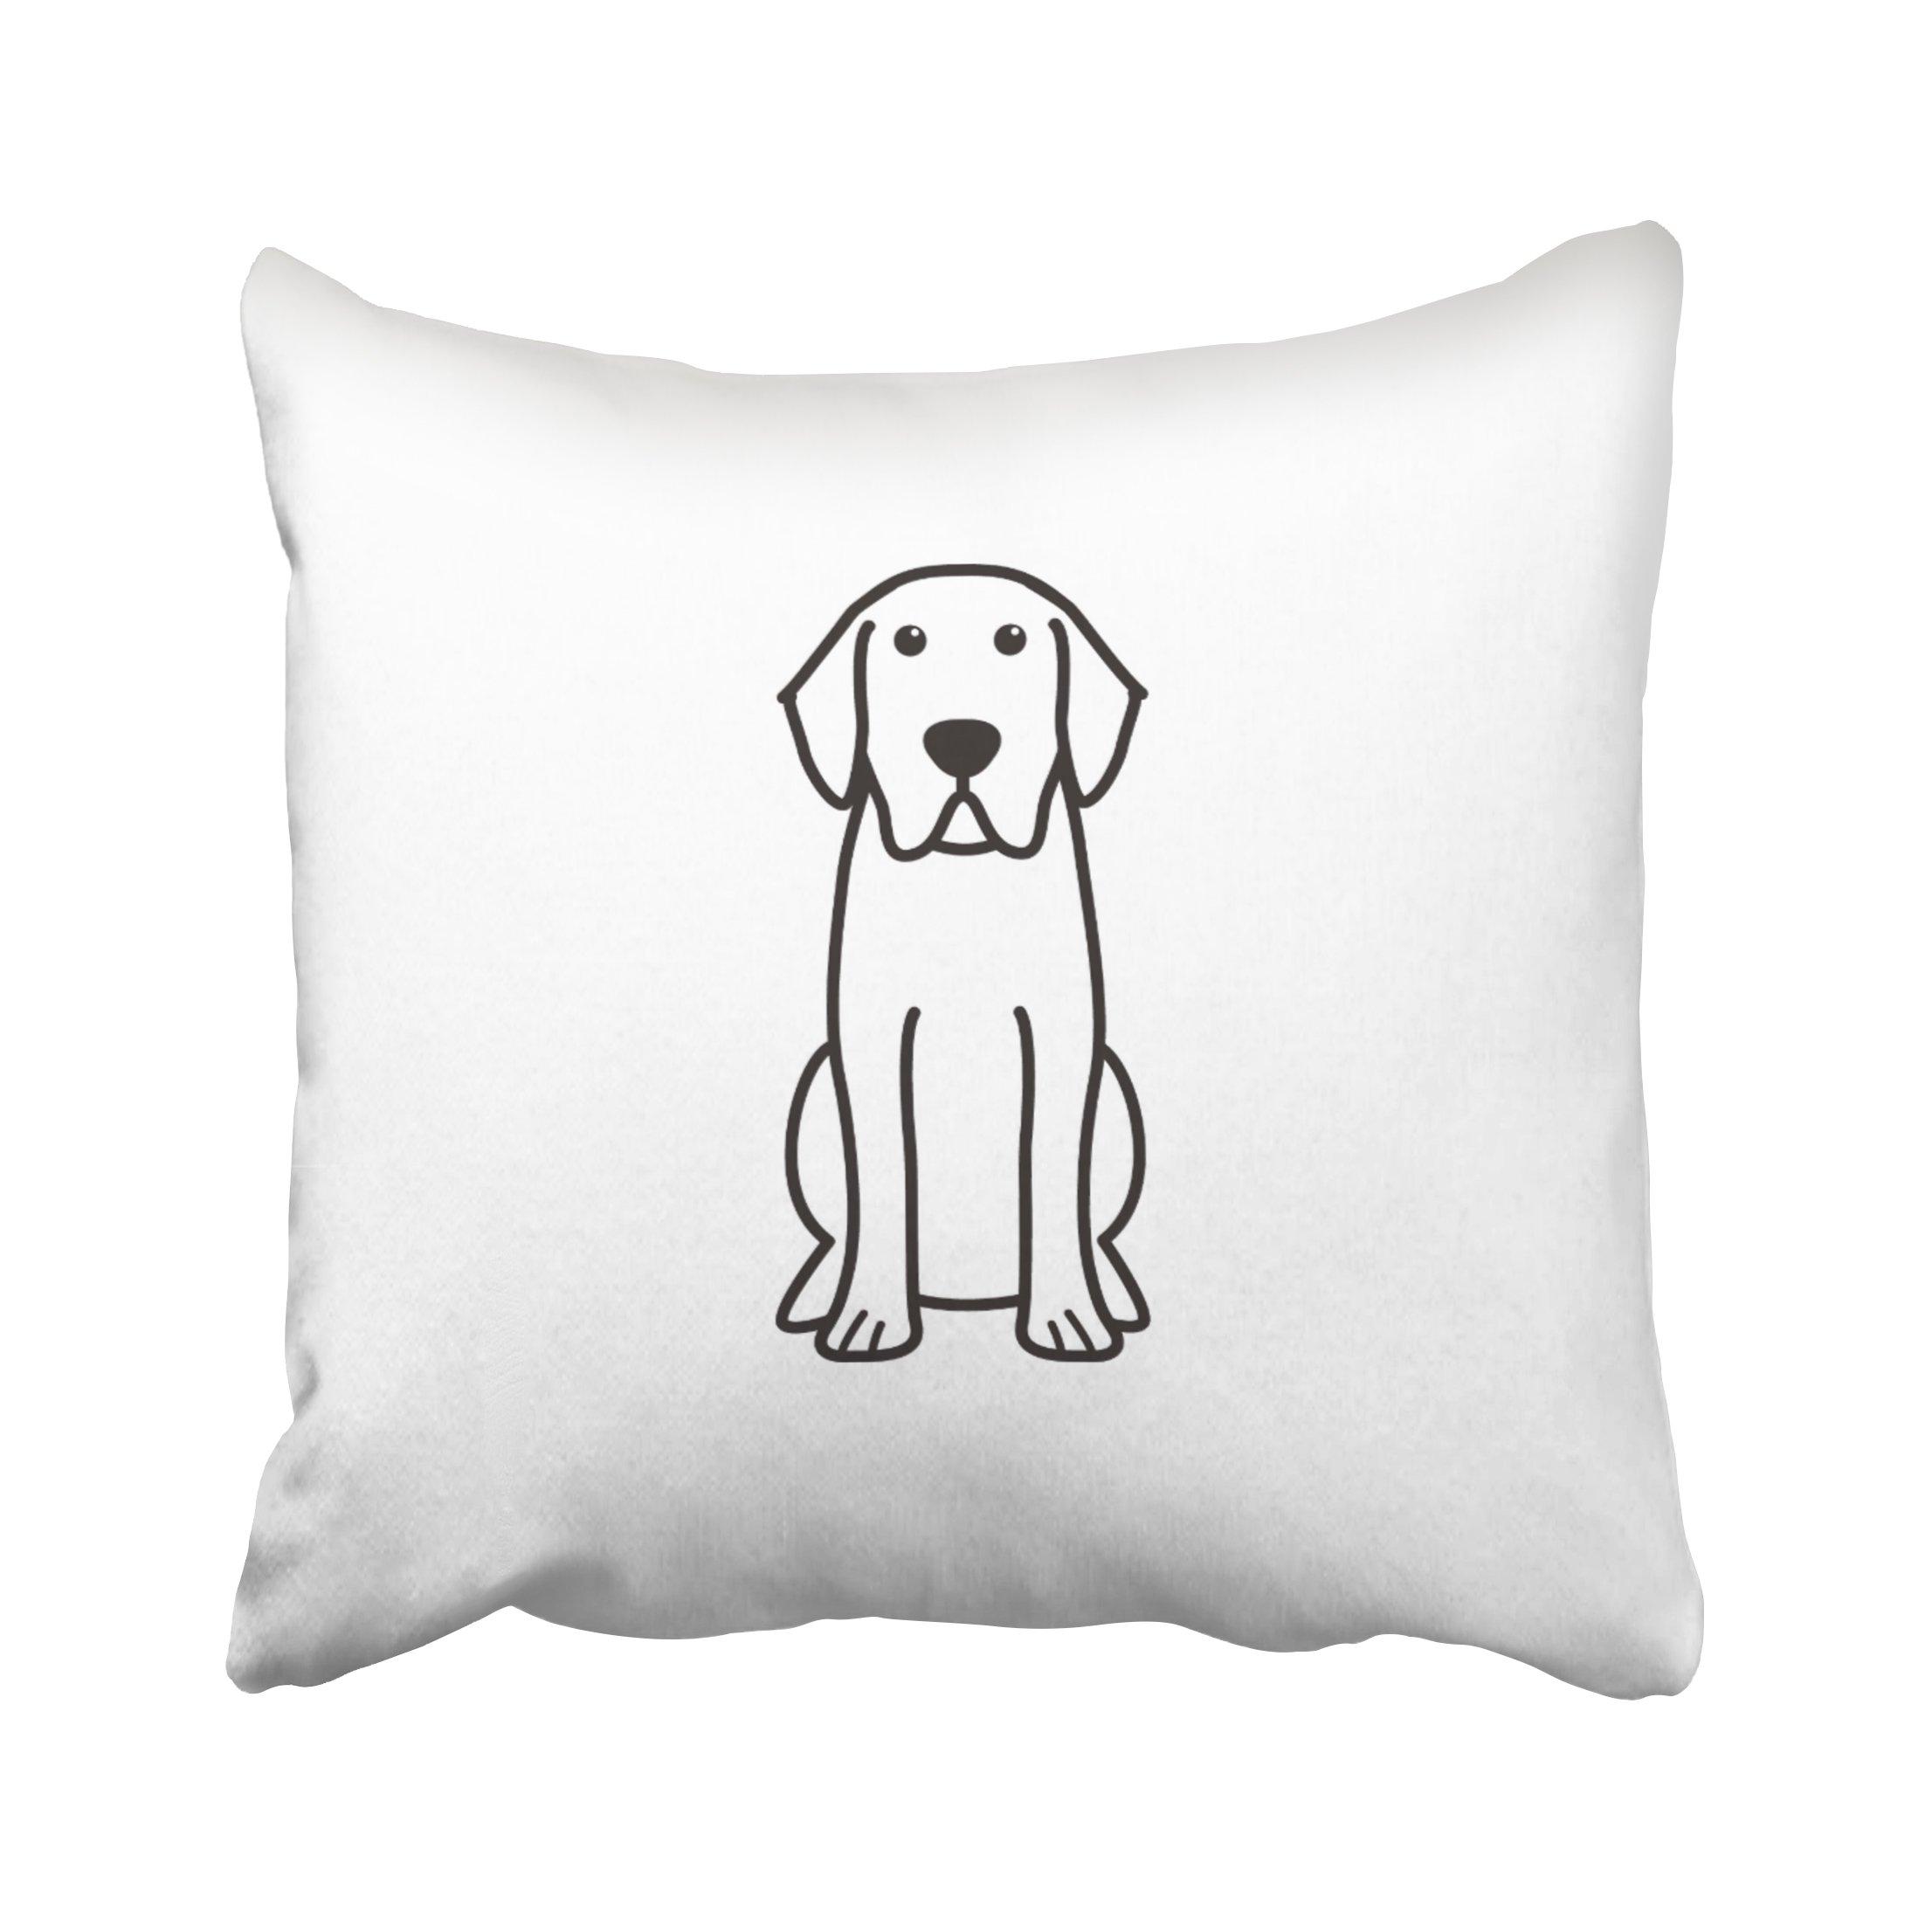 ONELZ Labrador Retriever Dog Square Decorative Throw Pillow Case, Fashion Style Zippered Cushion Pillow Cover (20X20 inch)